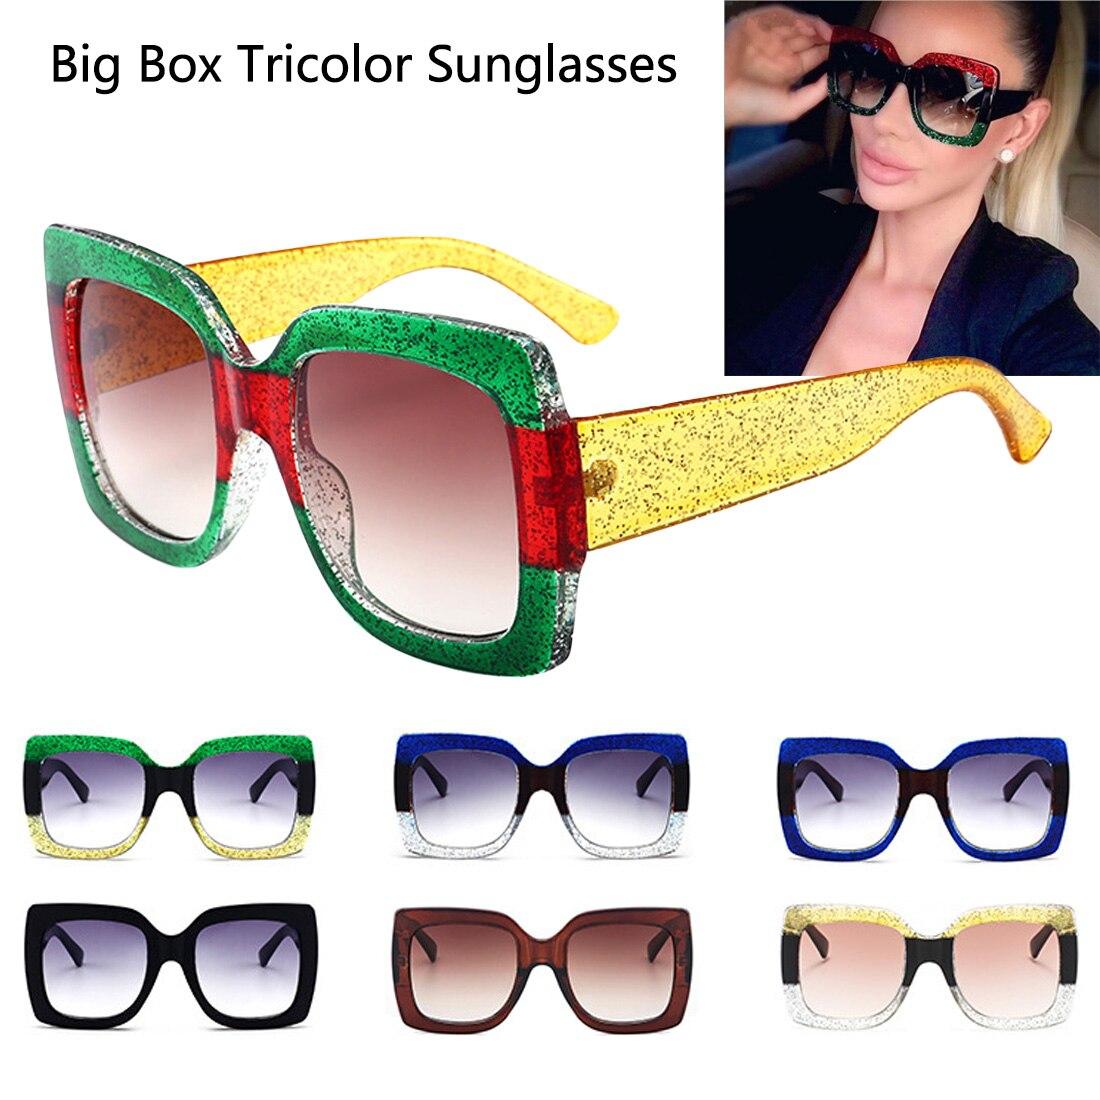 The new Big box sunglasses men and women retro fashion trend beauty glasses